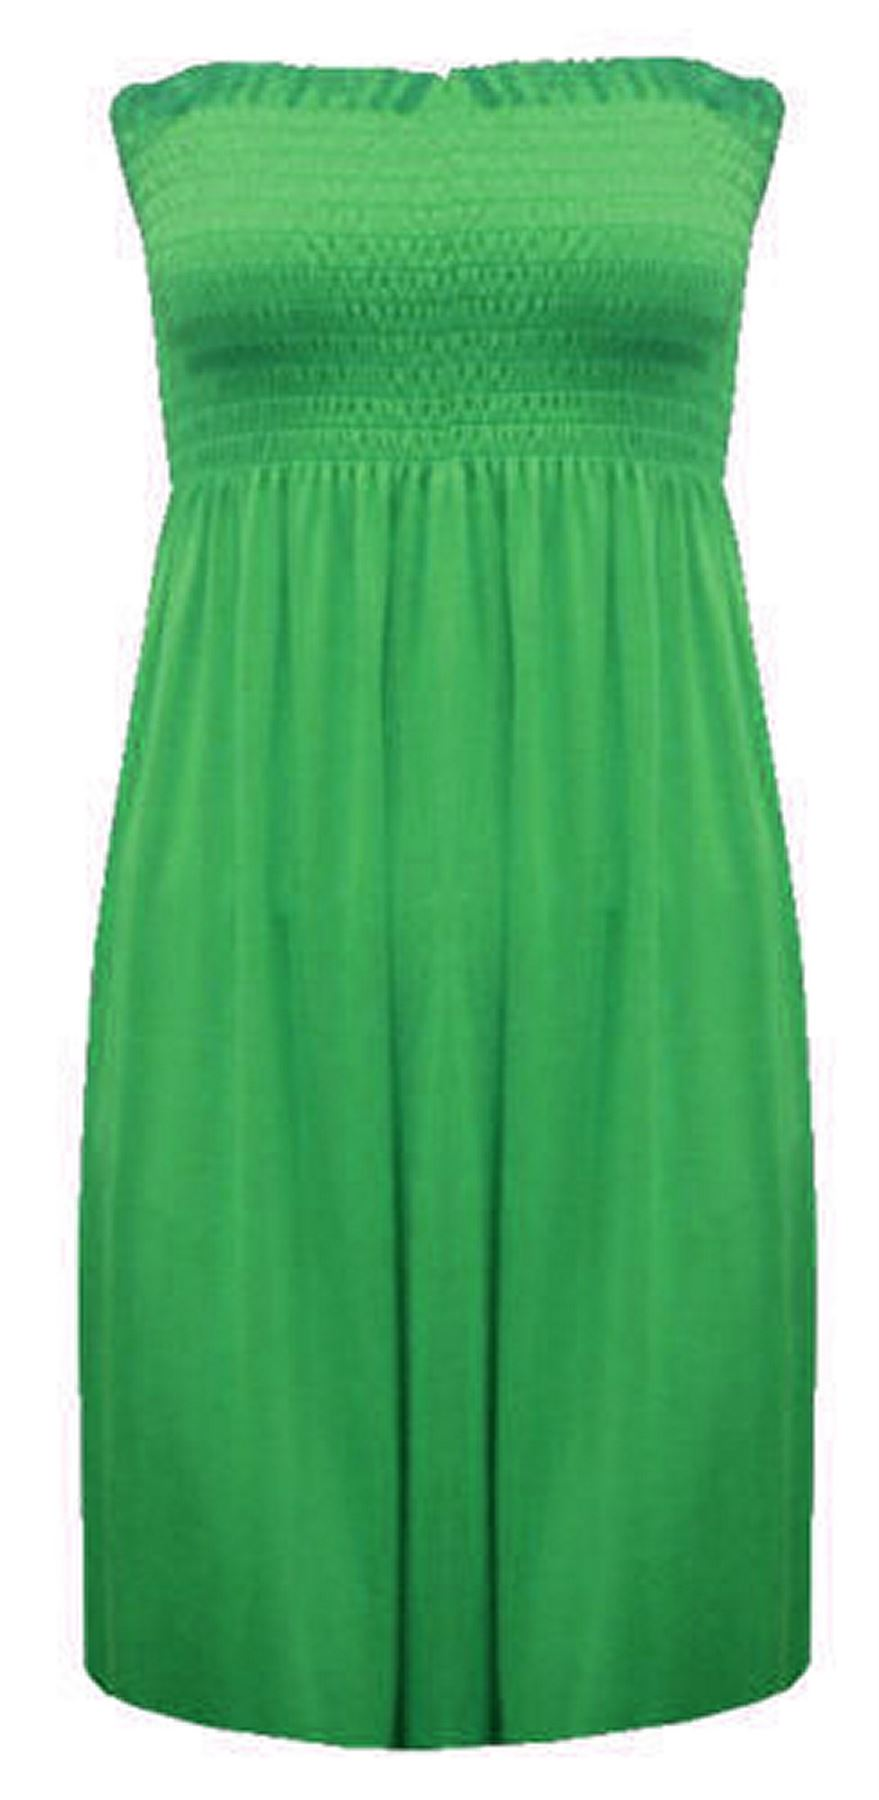 New-Ladies-Bandeau-Boob-Gathering-Tops-Boob-Tube-Beach-Wear-Tunics-8-26 thumbnail 37